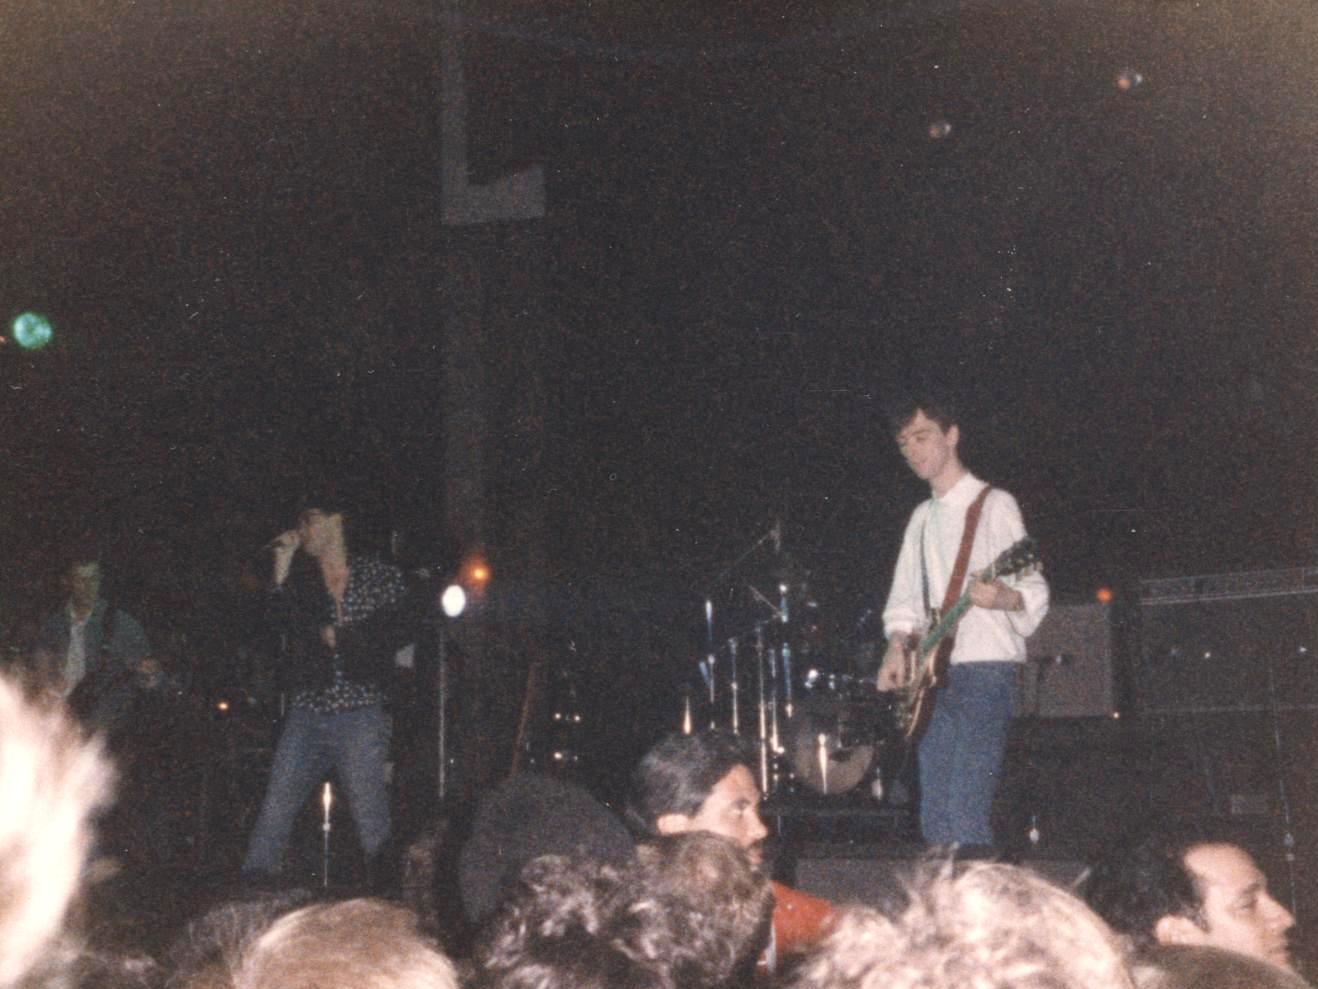 1985-06-18 a